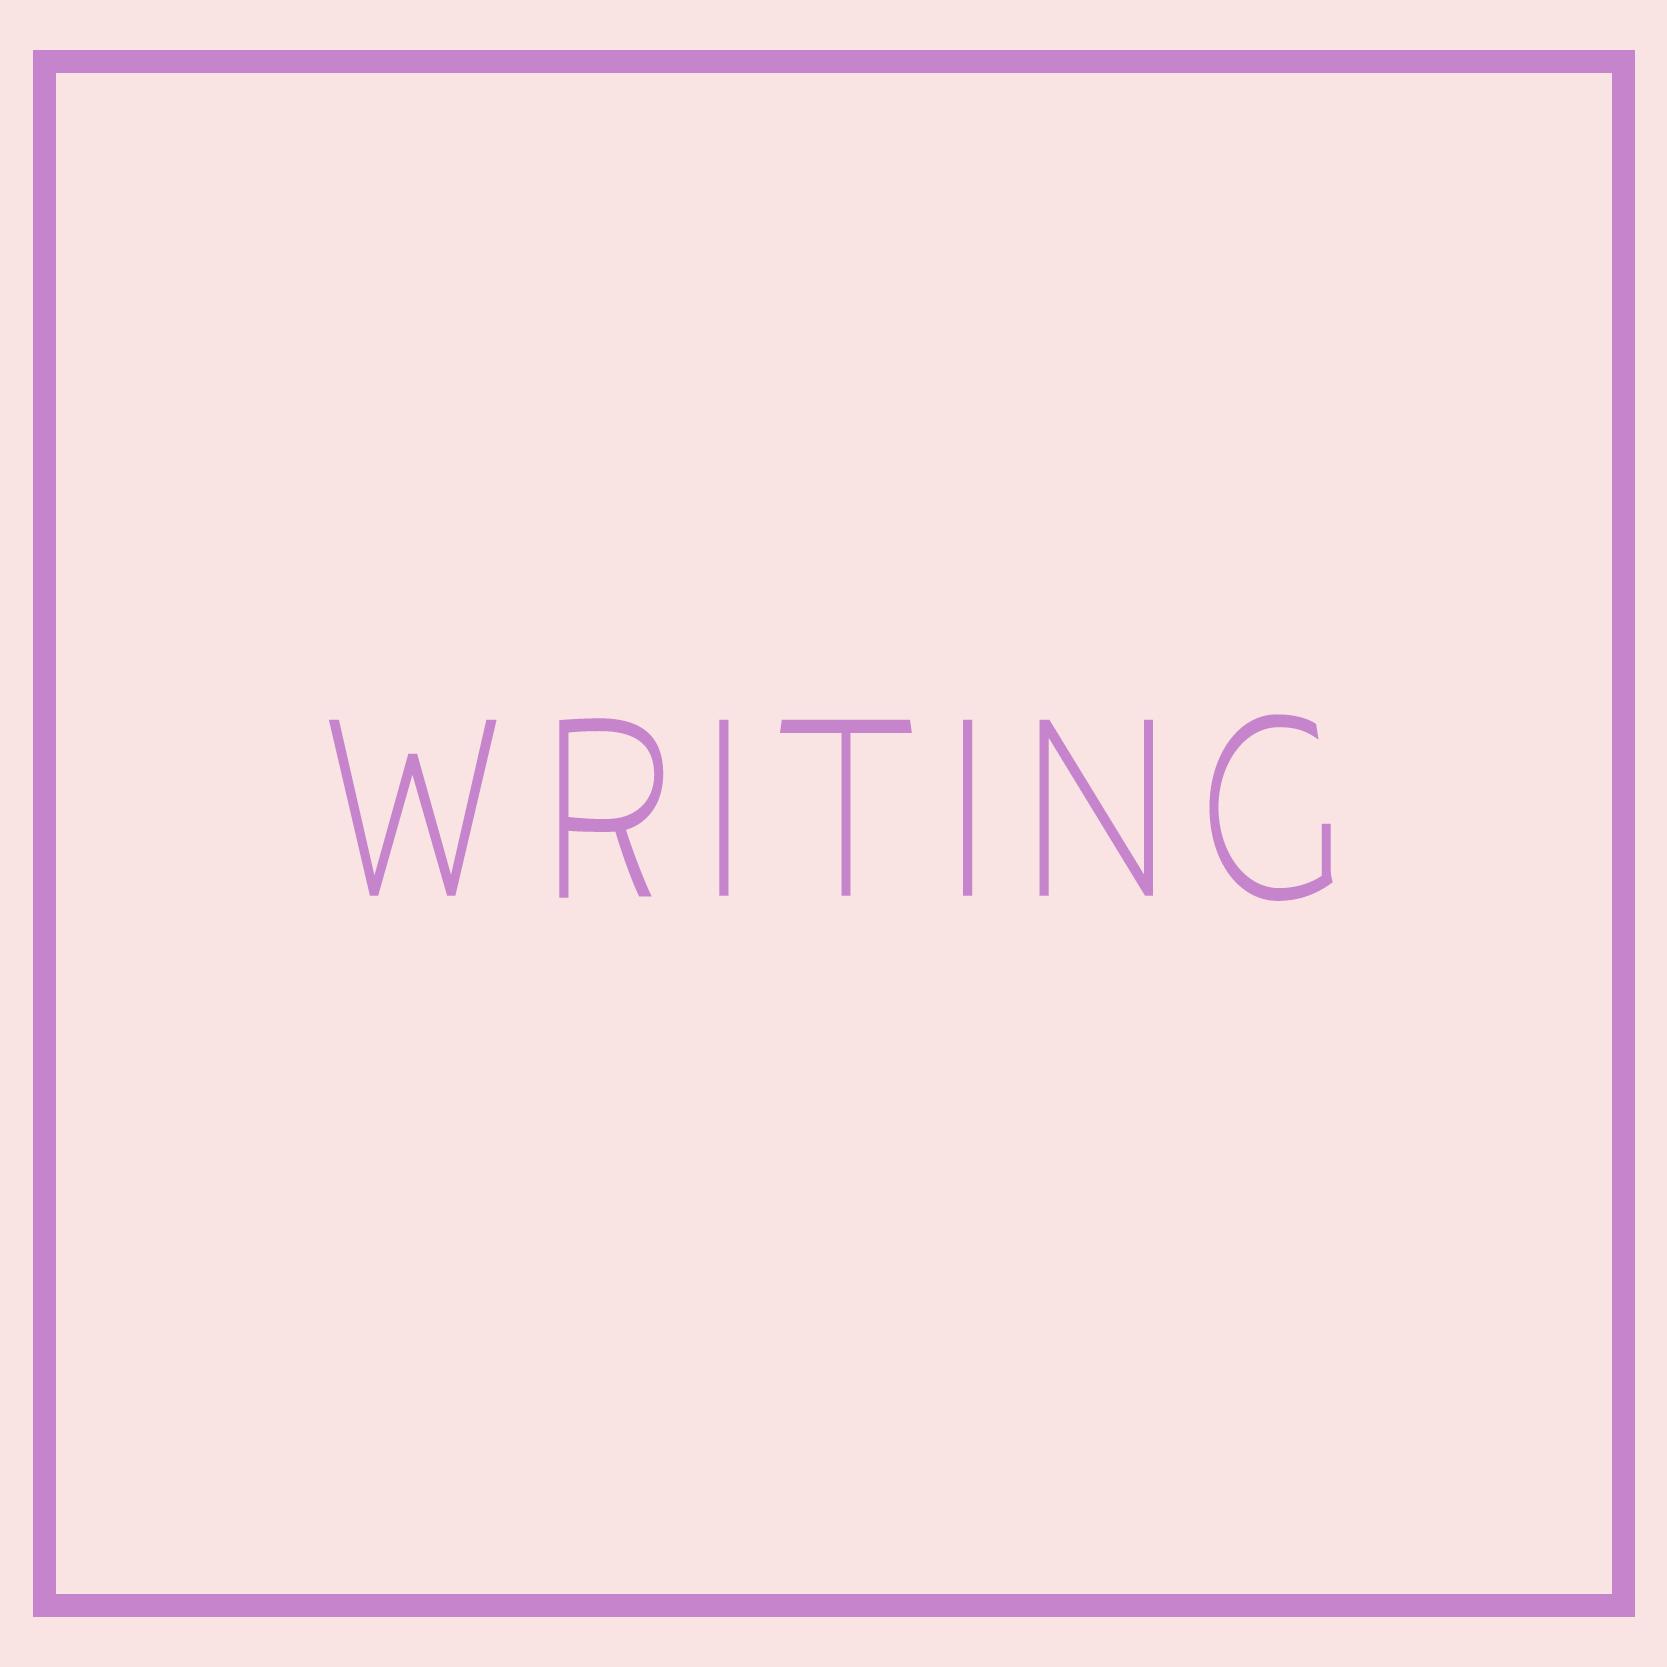 Writing_WhereToStartButton_Template.png